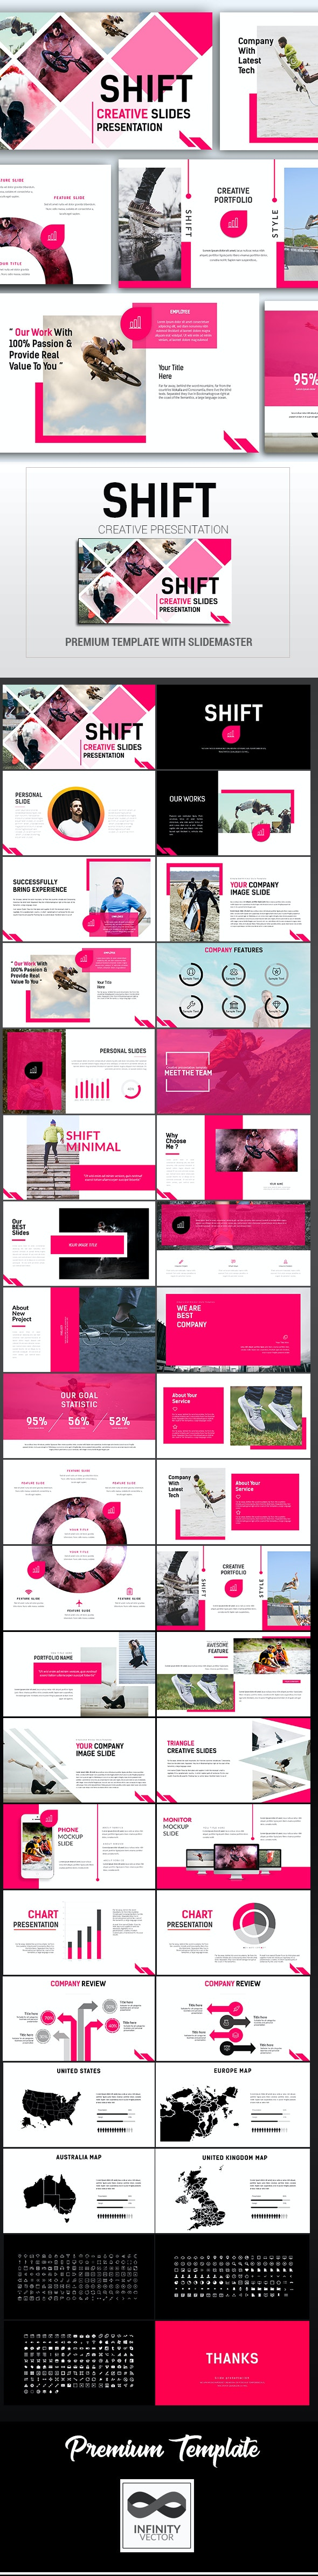 Shift Creative Presentation - PowerPoint Templates Presentation Templates